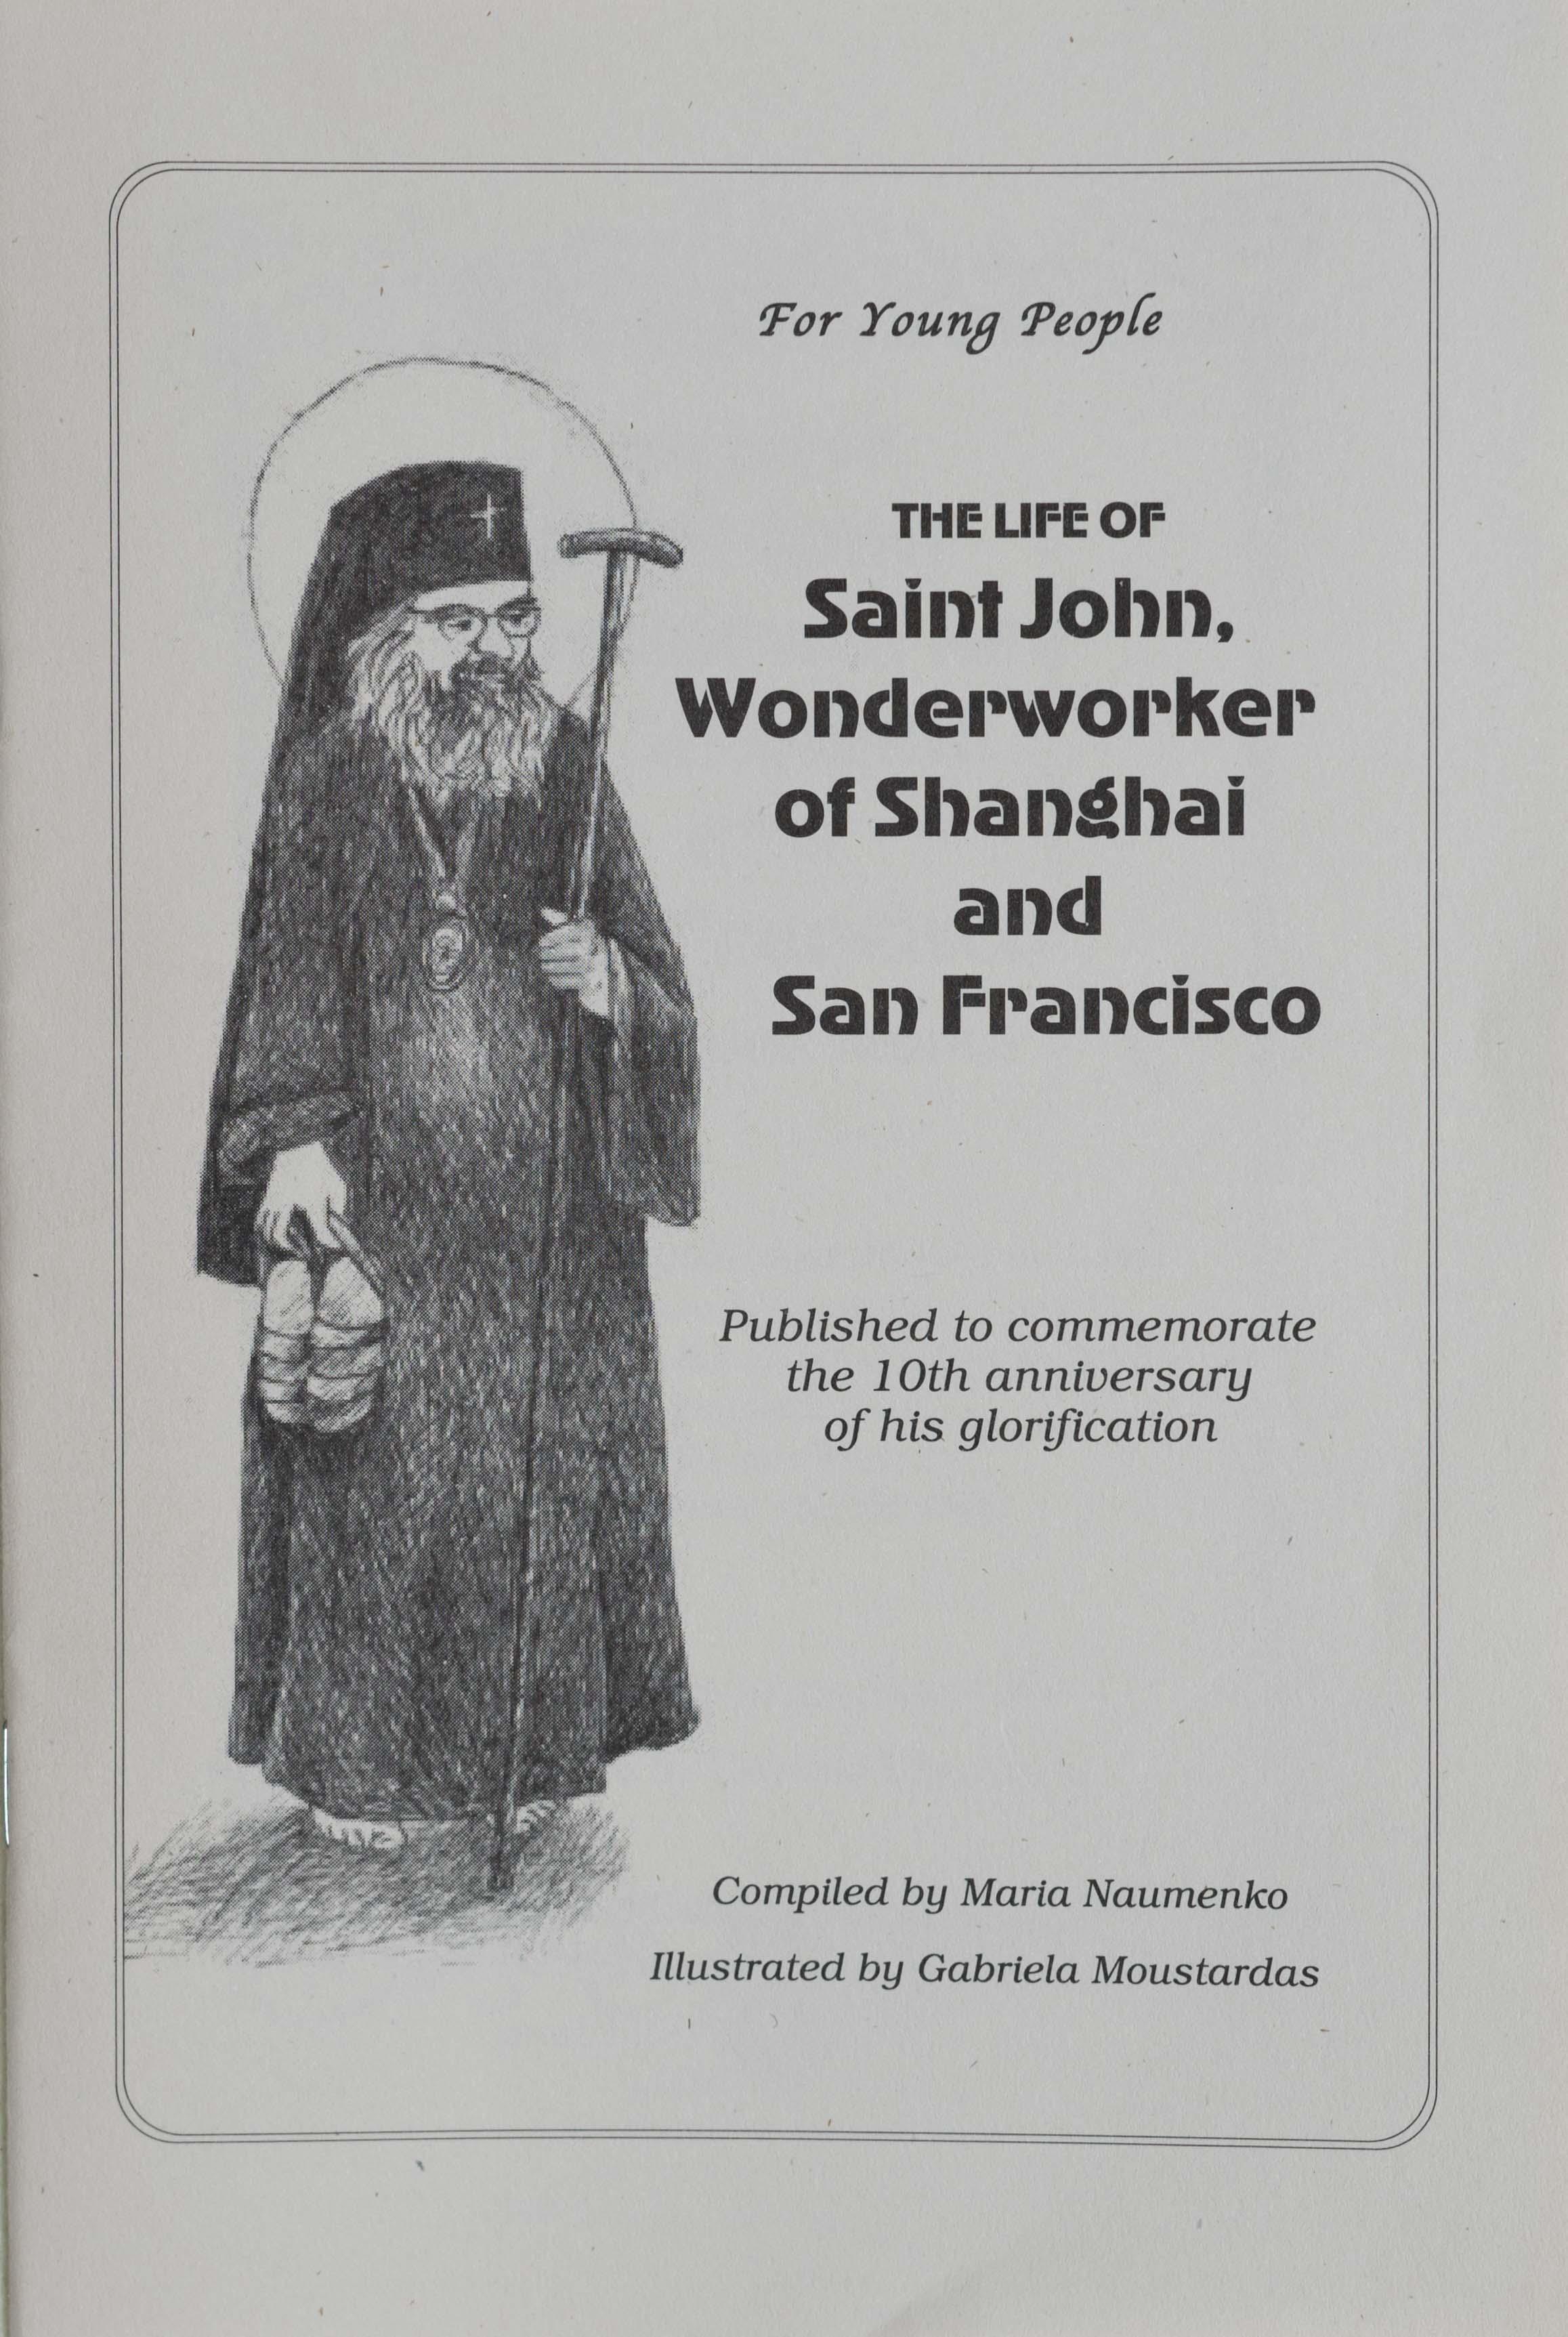 The Life of Saint John Wonderworker of Shanghai and San Francisco